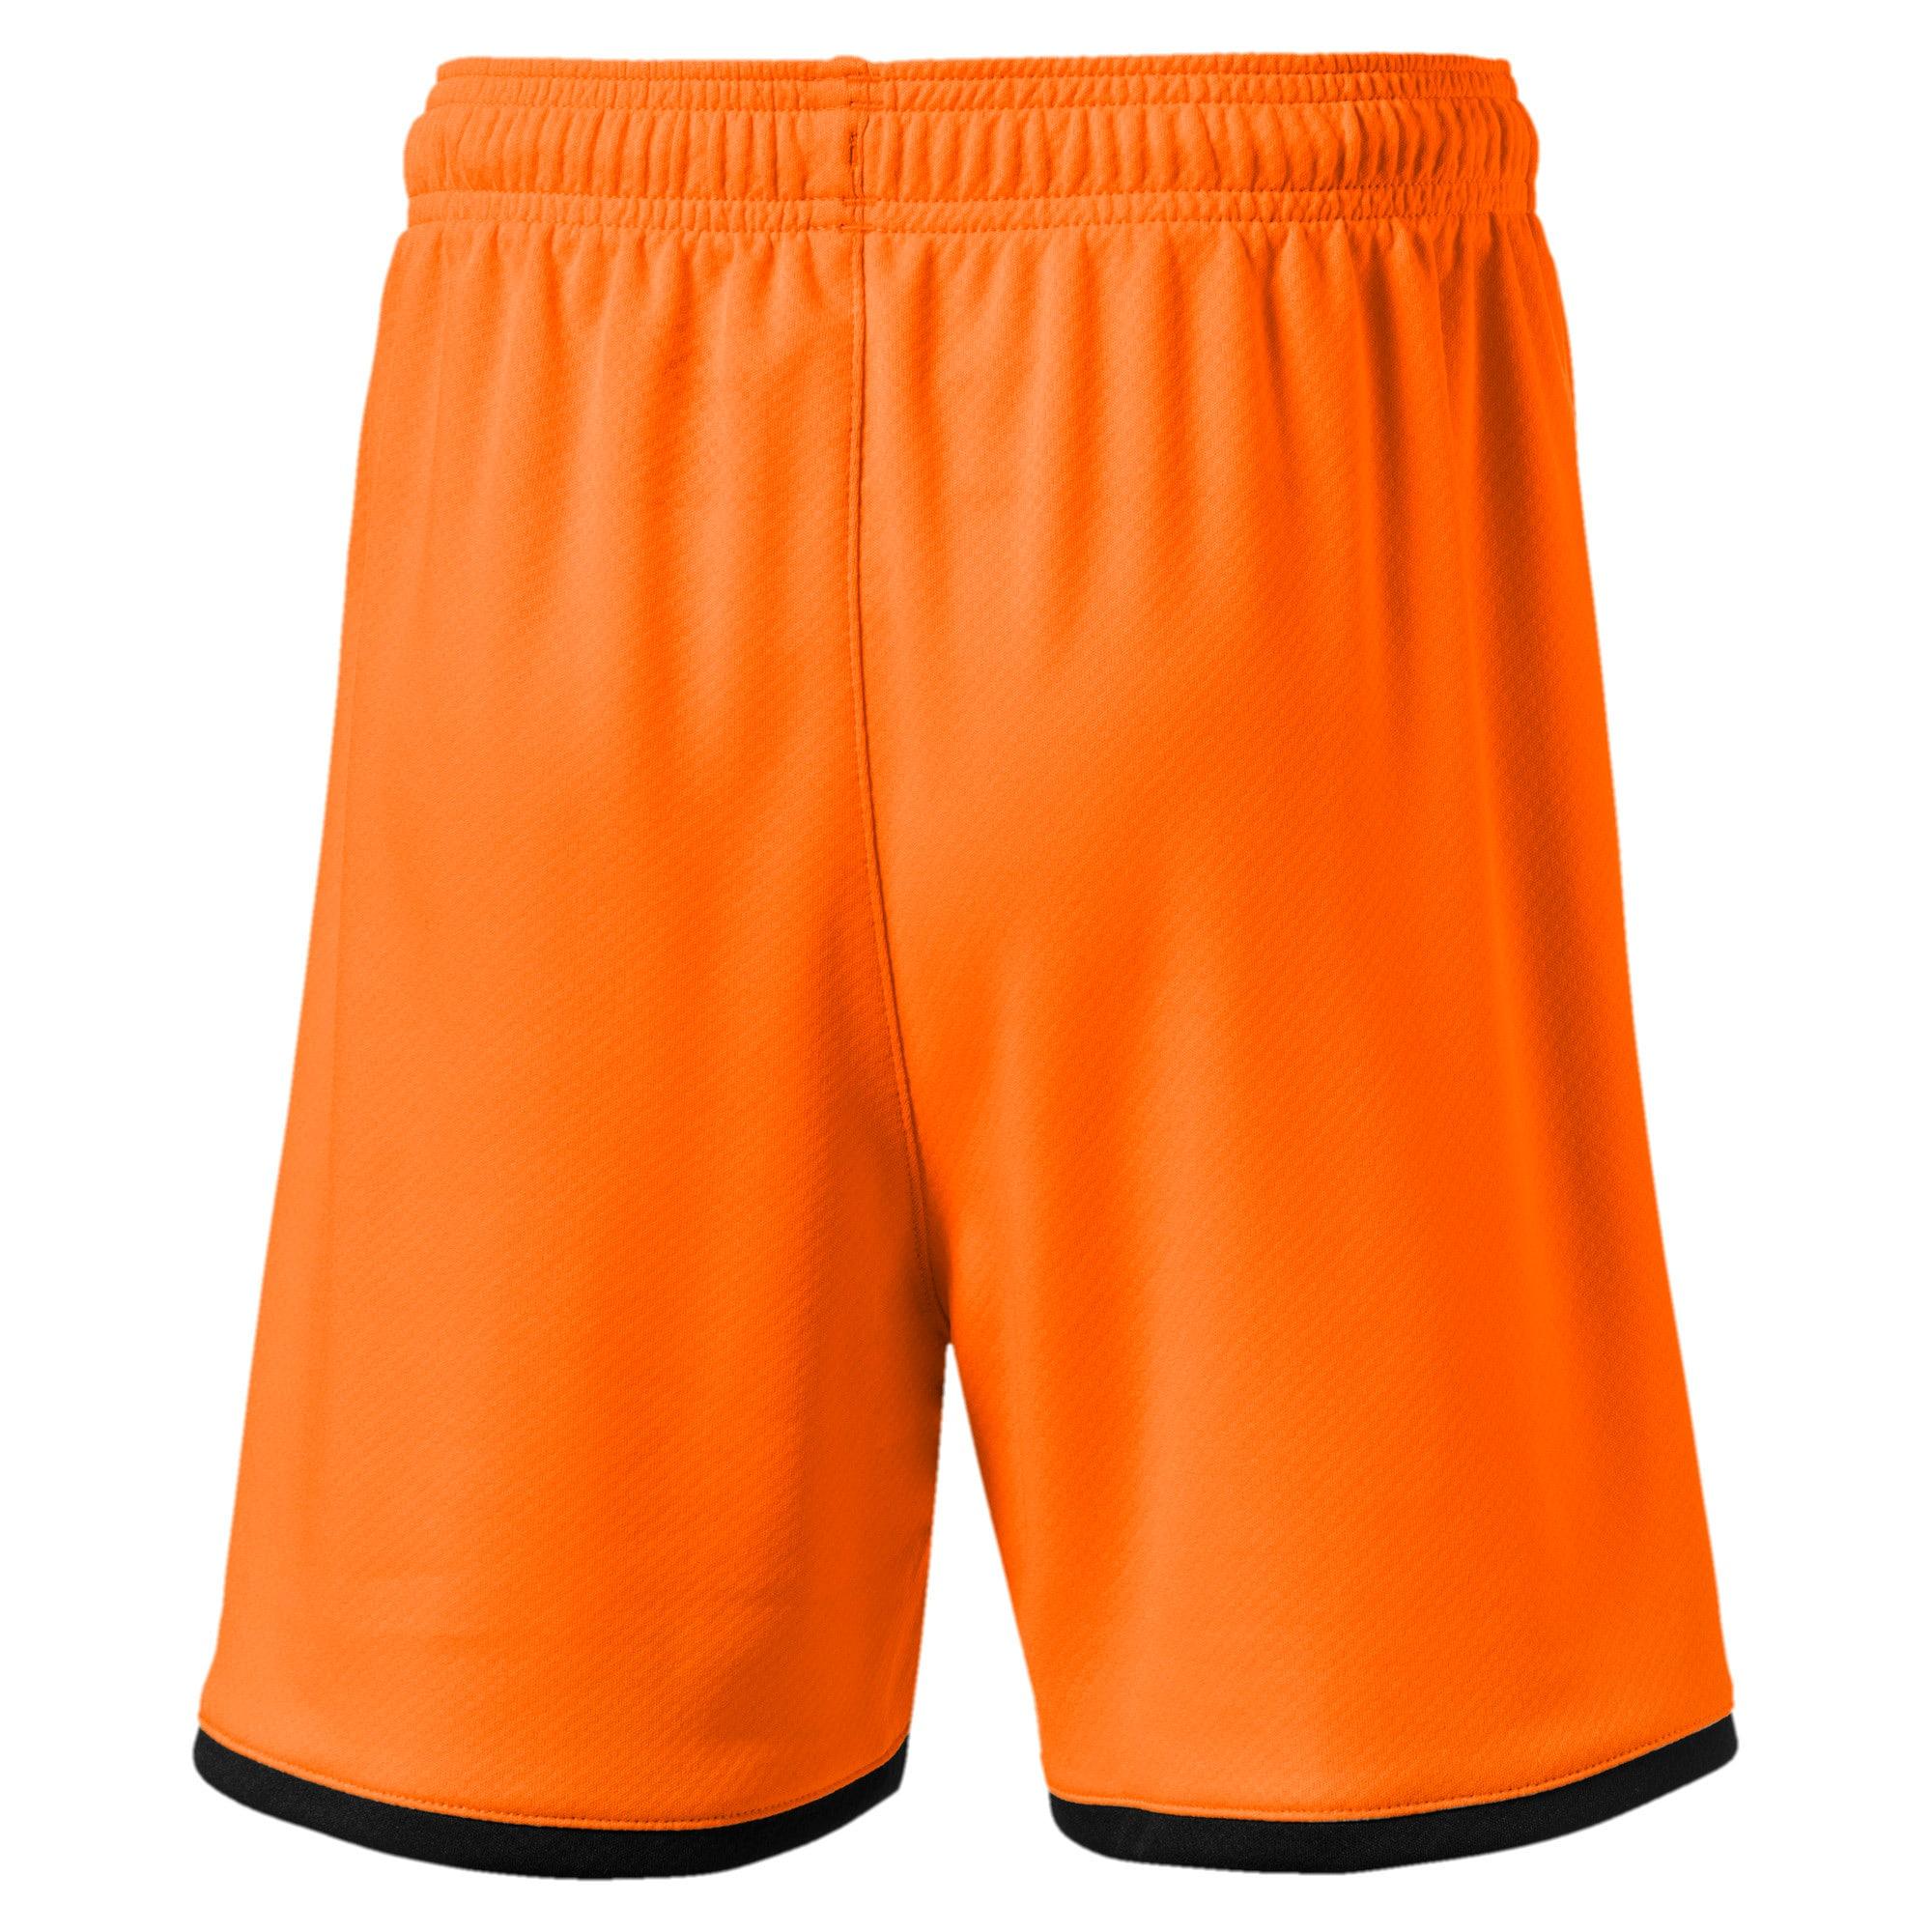 Thumbnail 2 of Valencia CF Boys' Replica Shorts, Vibrant Orange-Puma Black, medium